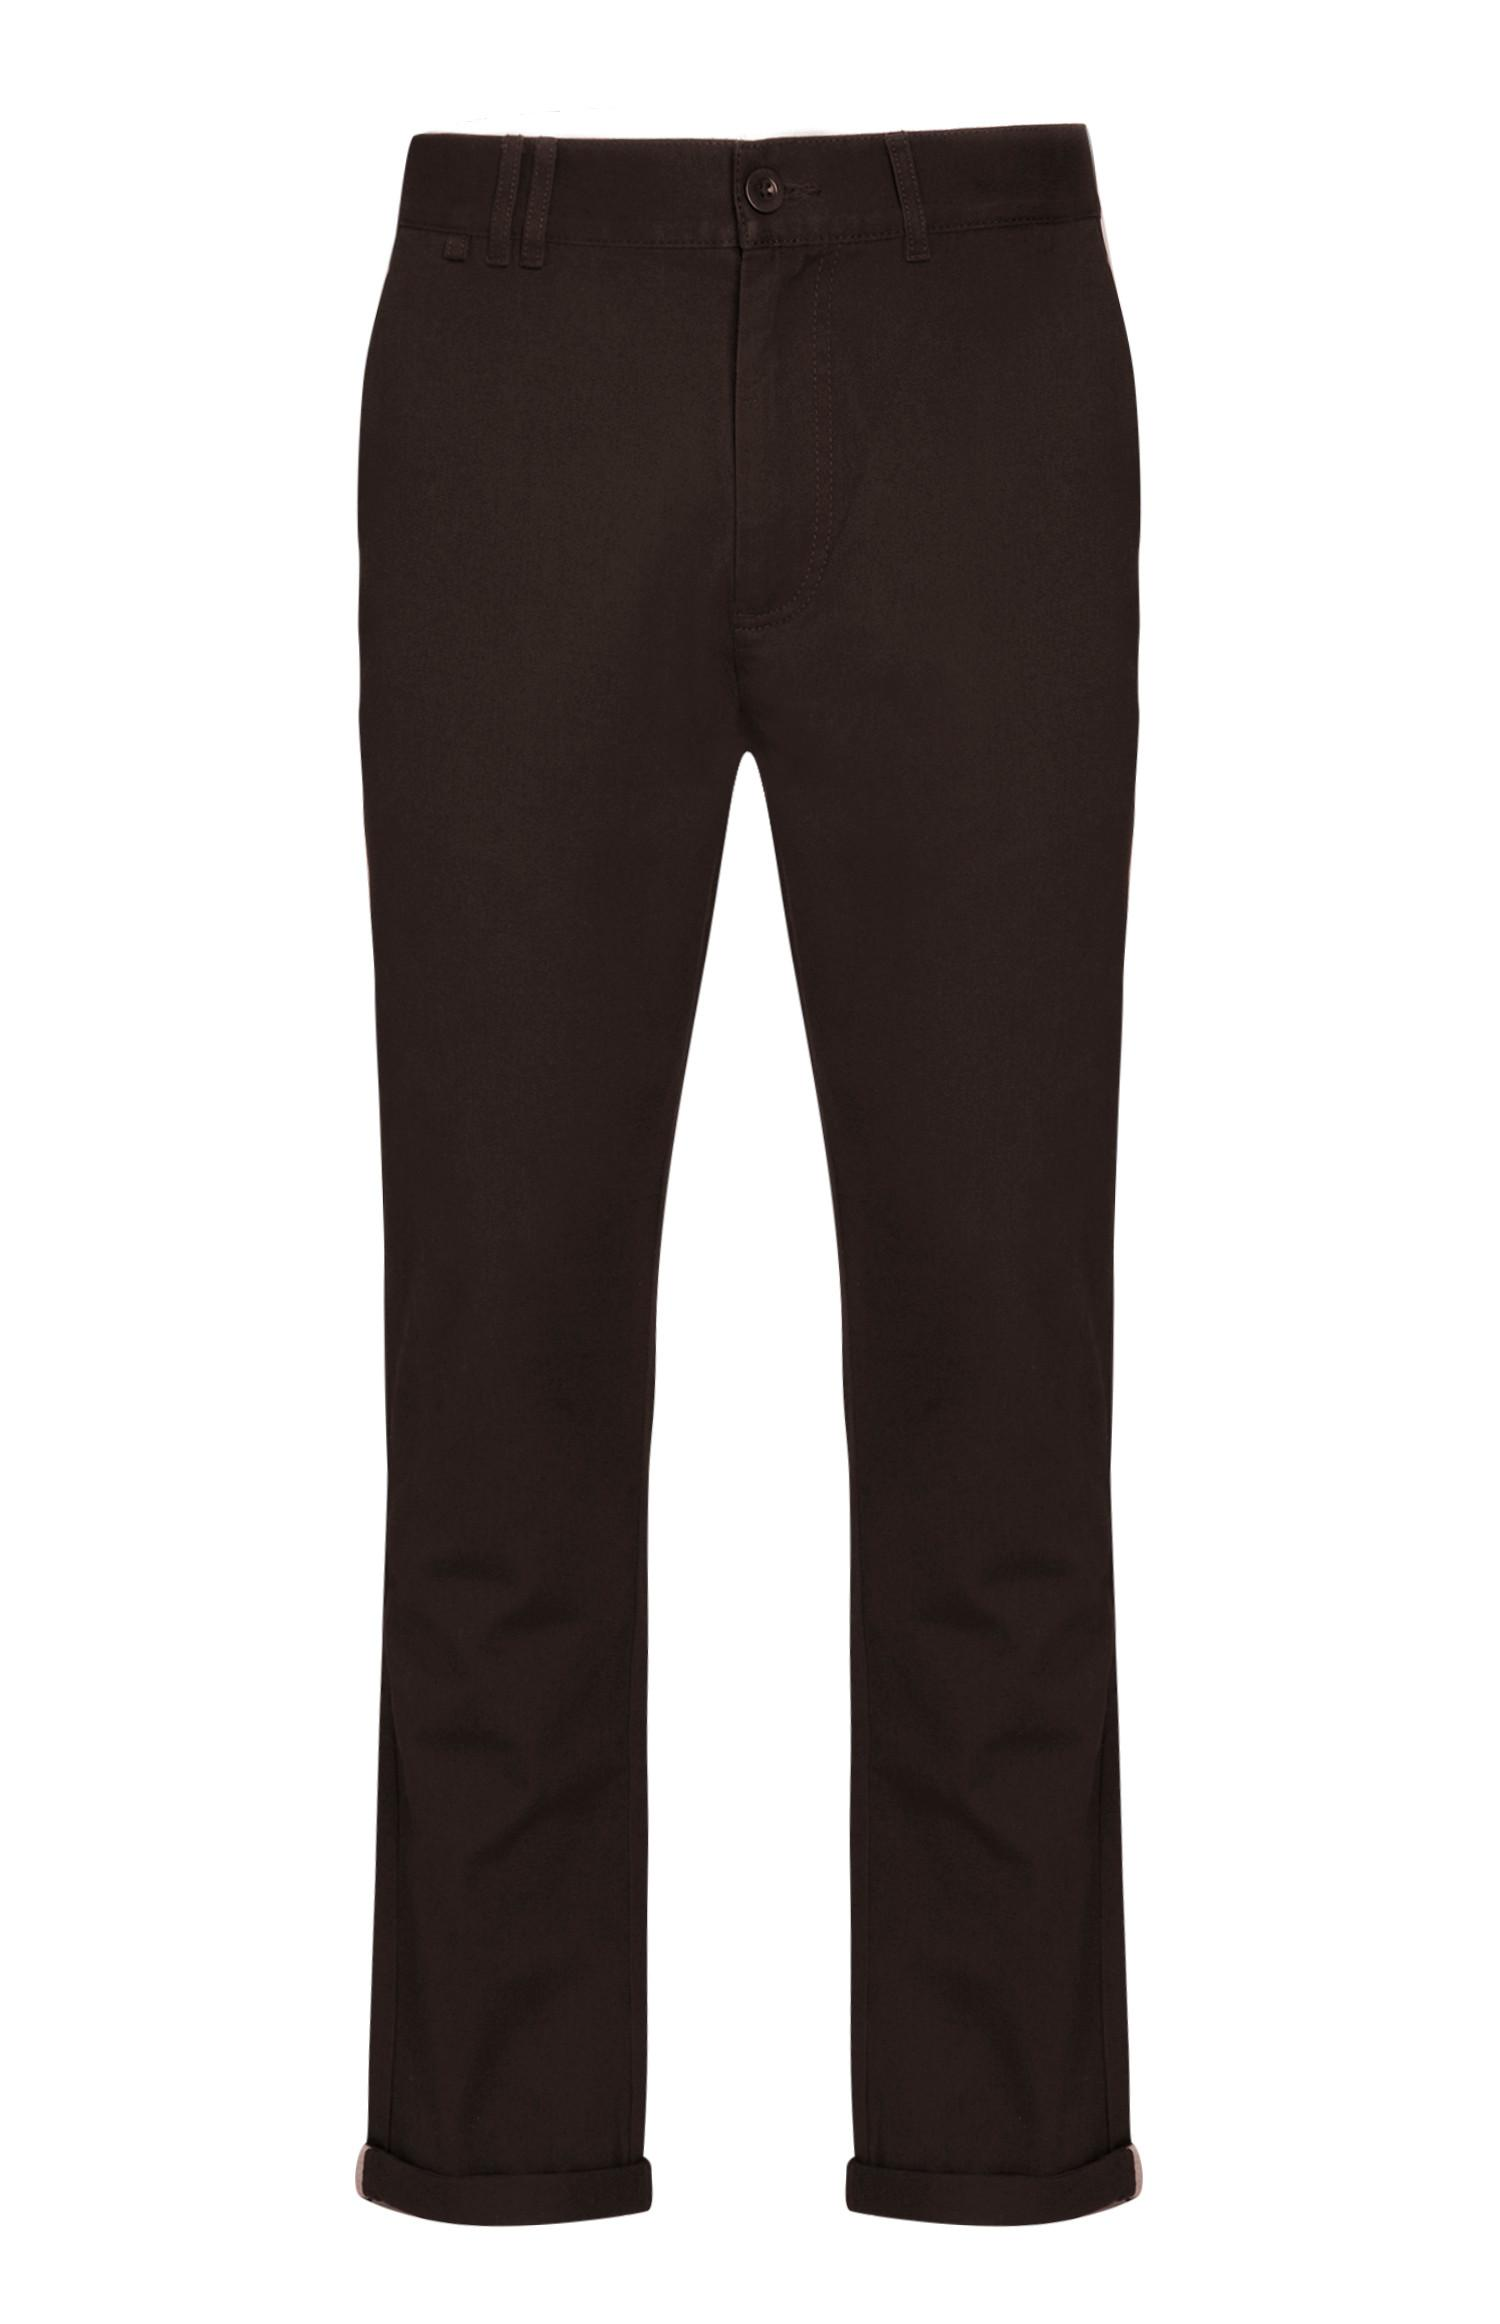 Brown Chino Trouser